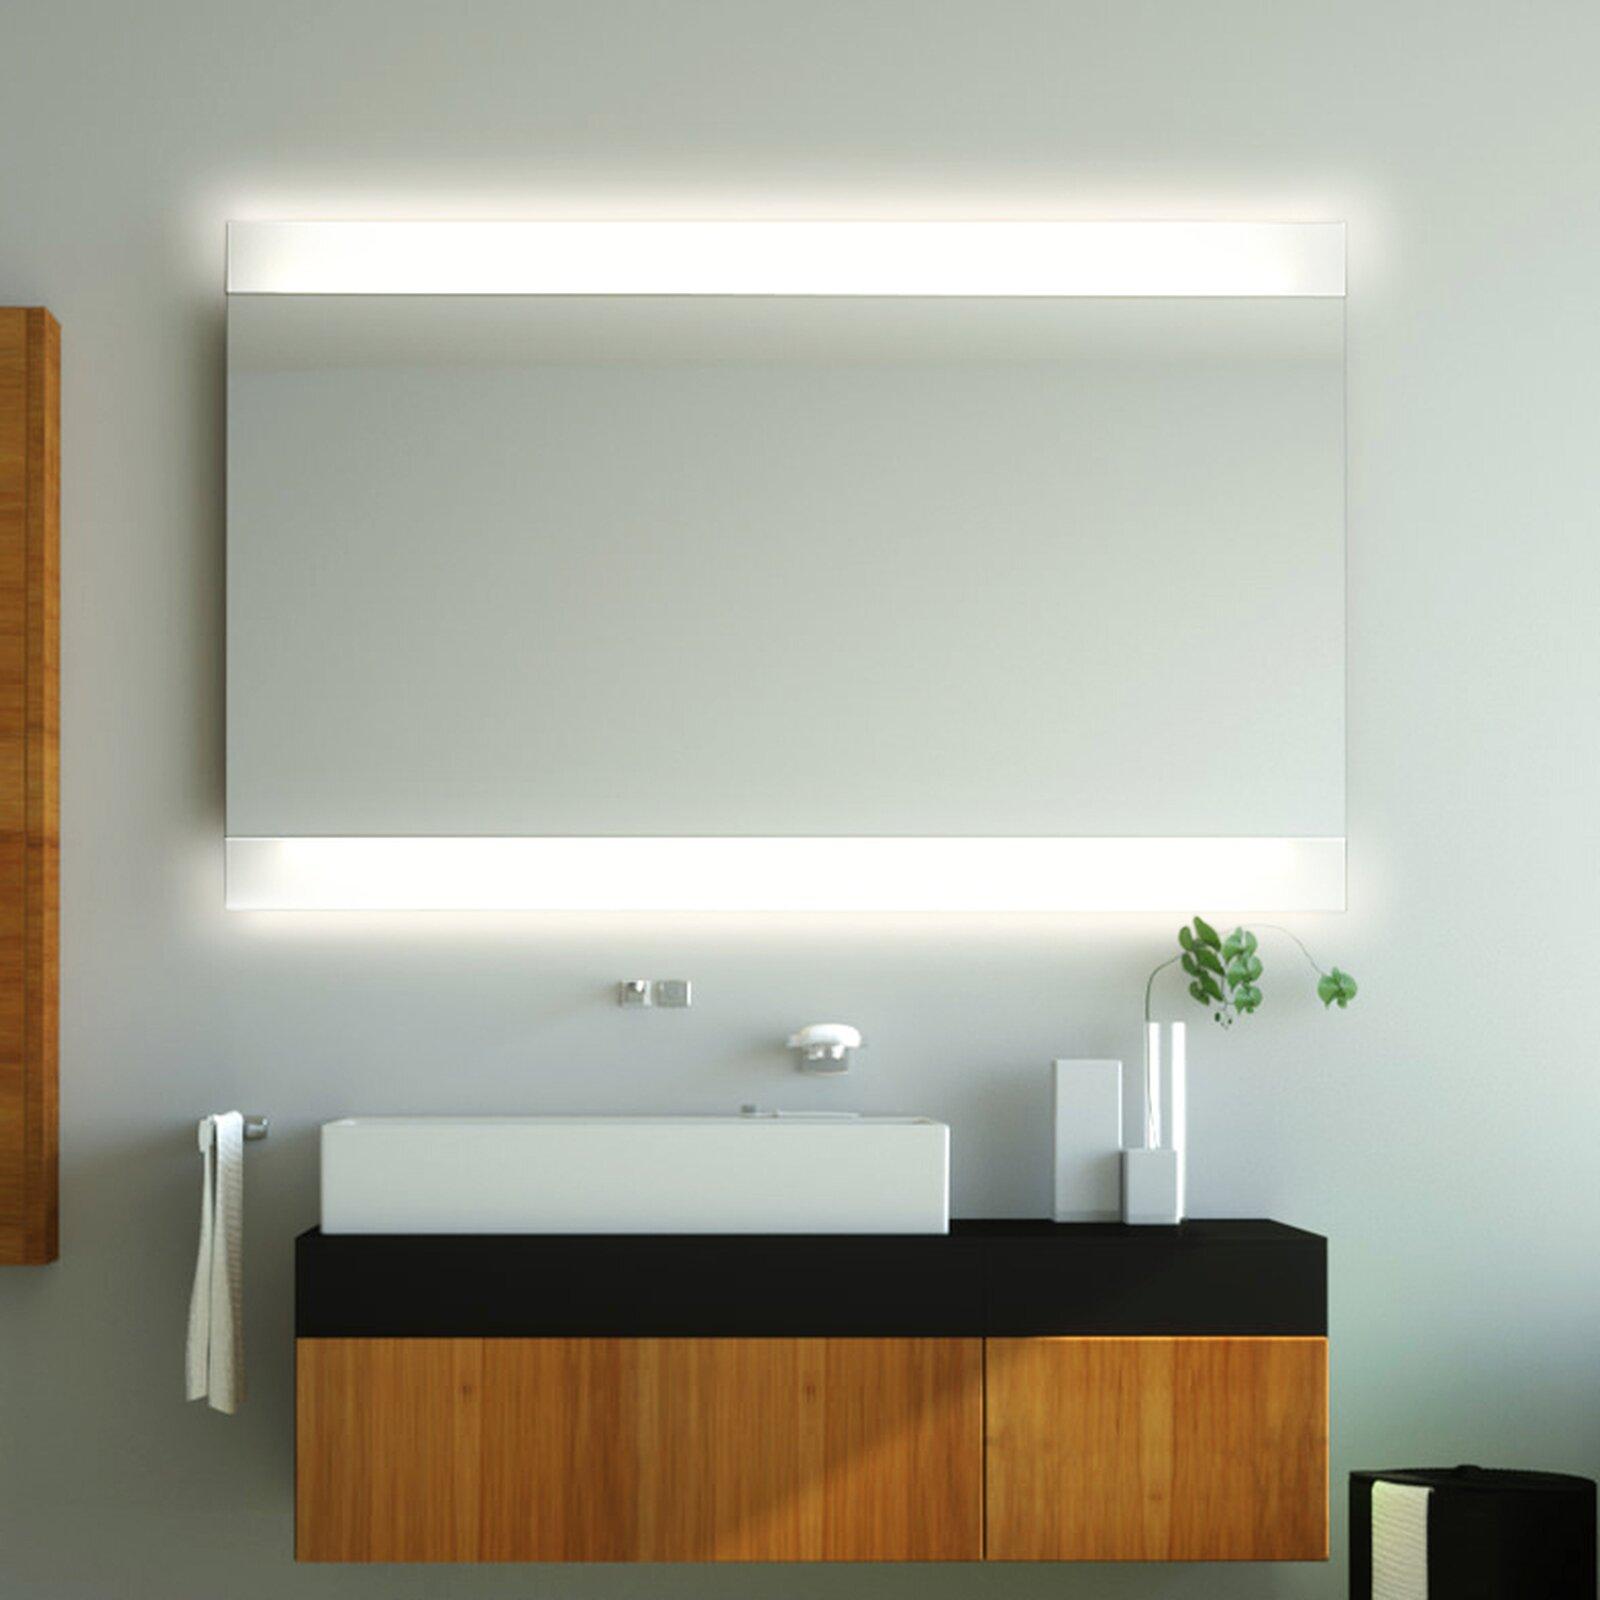 badspiegel phobos td duoled beleuchtung oben unten 149 00. Black Bedroom Furniture Sets. Home Design Ideas